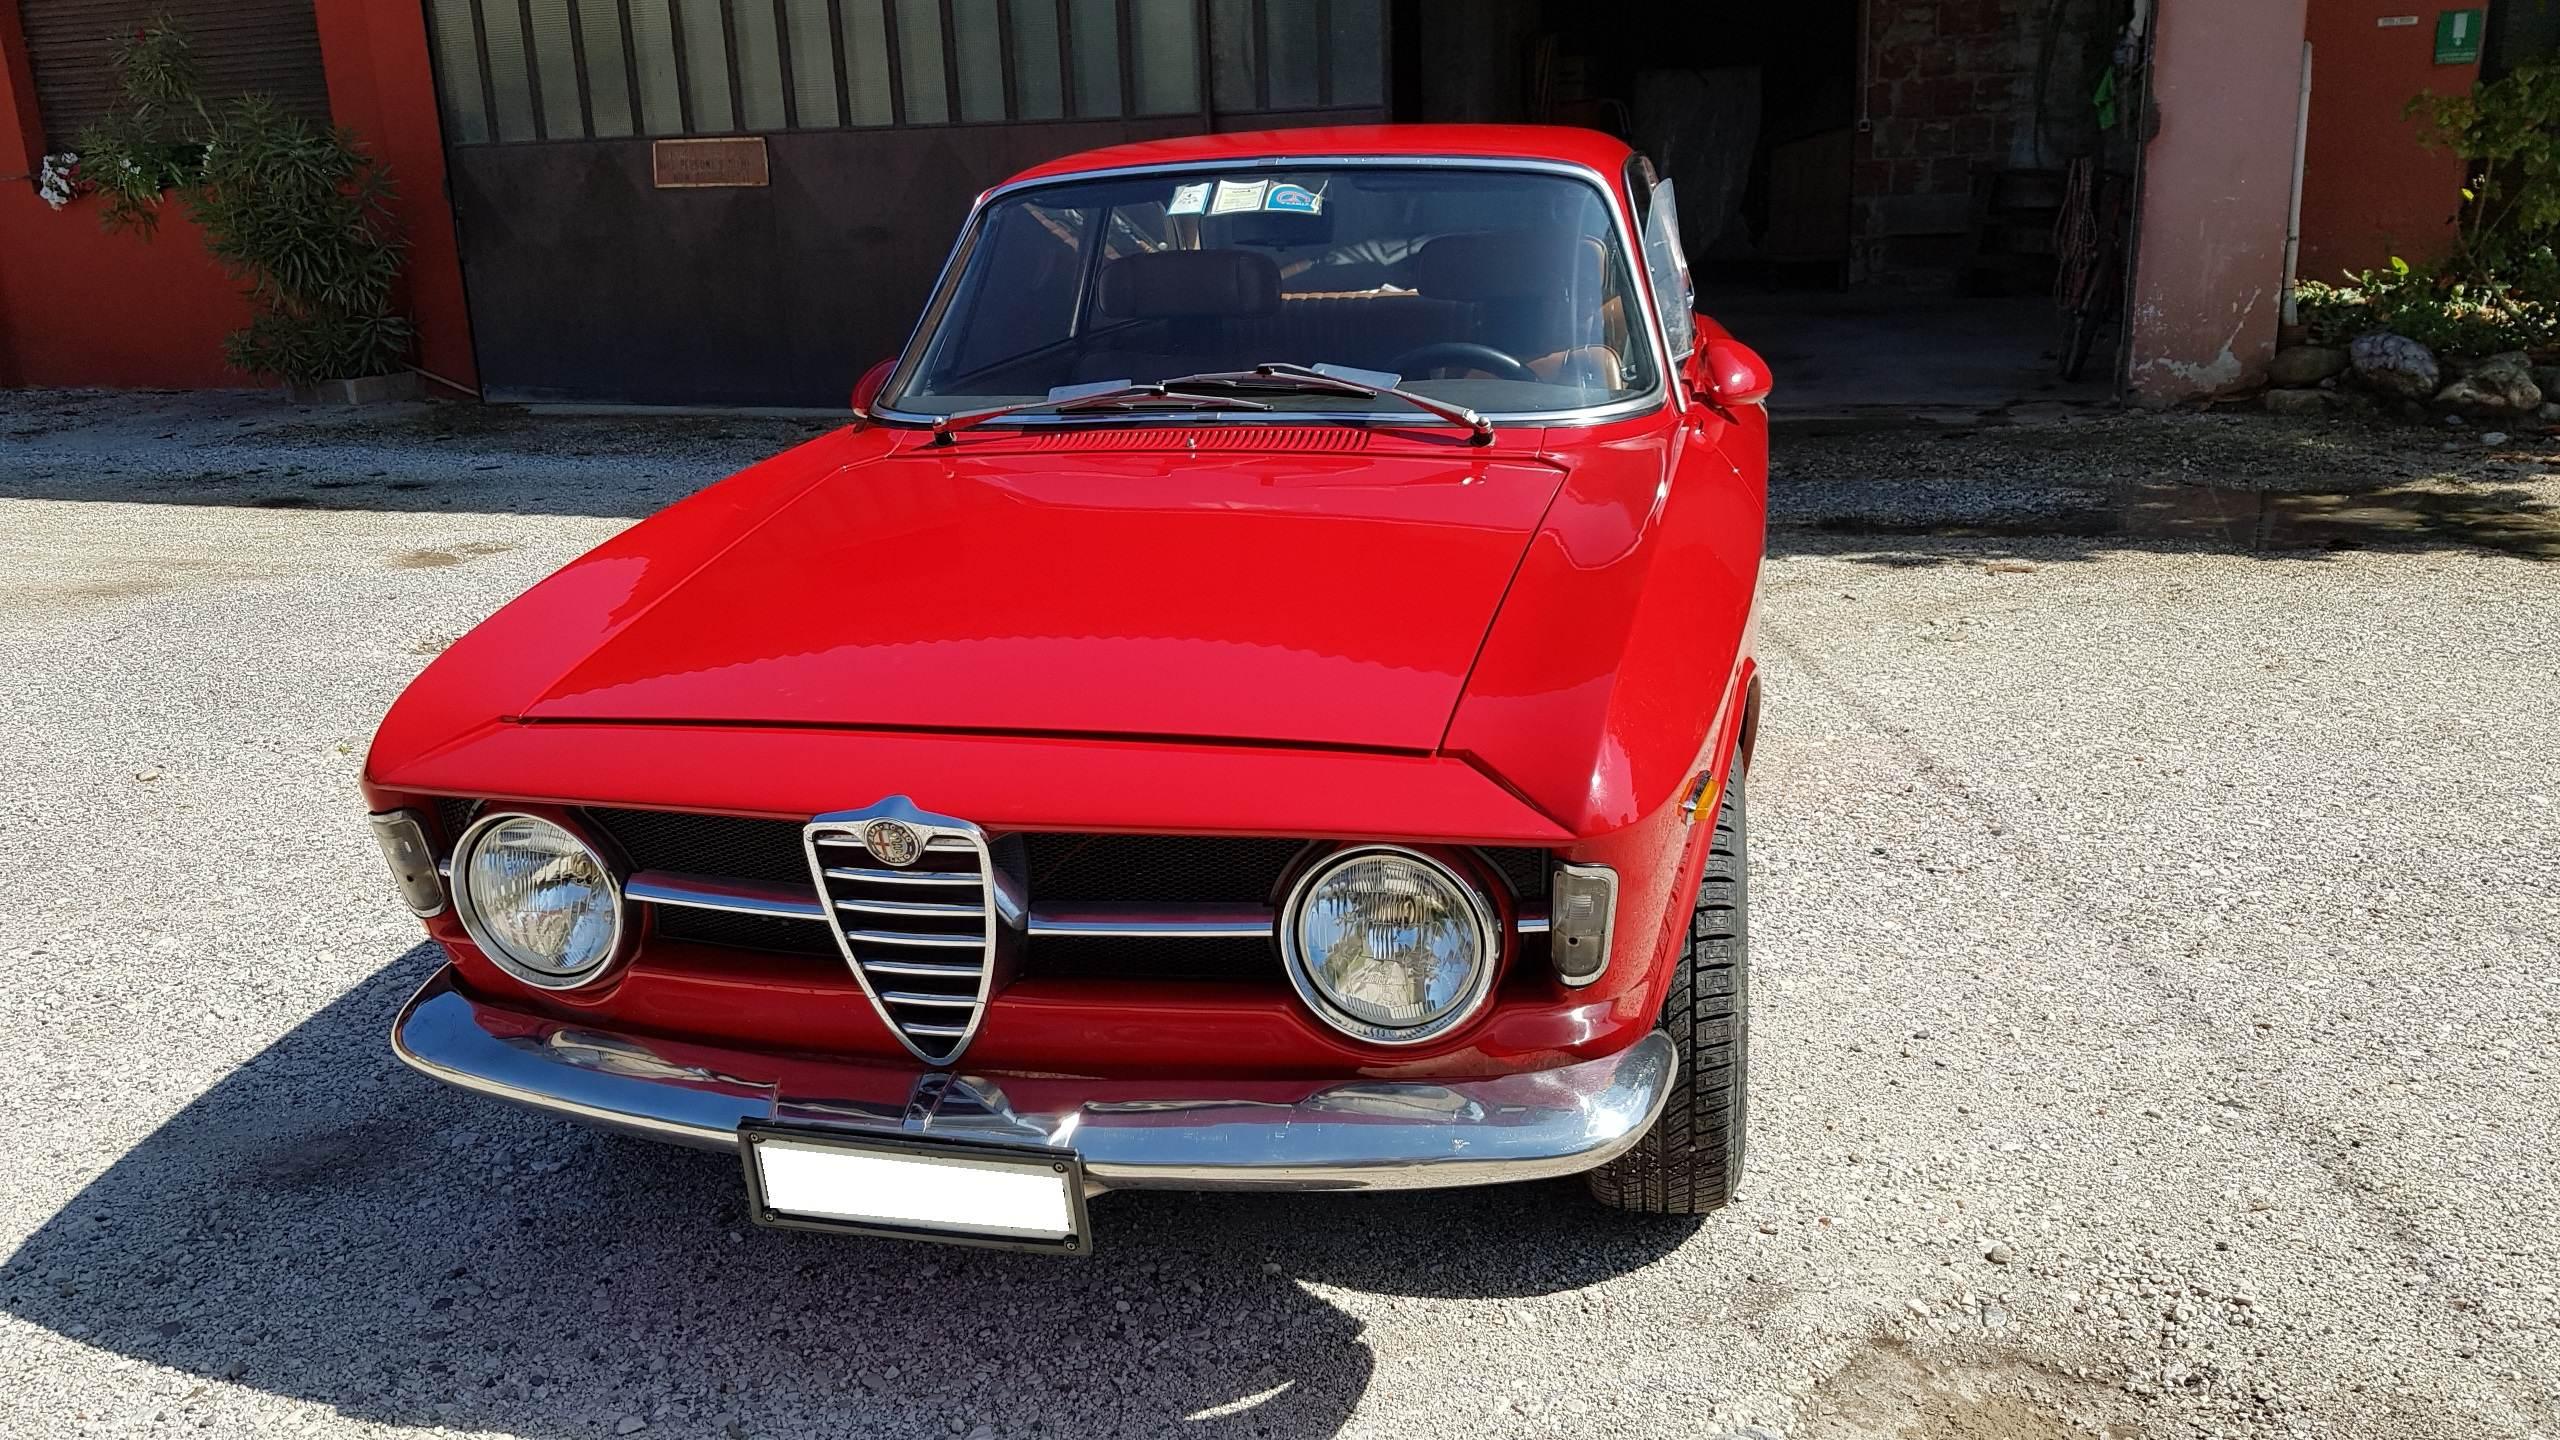 foto GT Junior 1300 scalino (1968) - 1